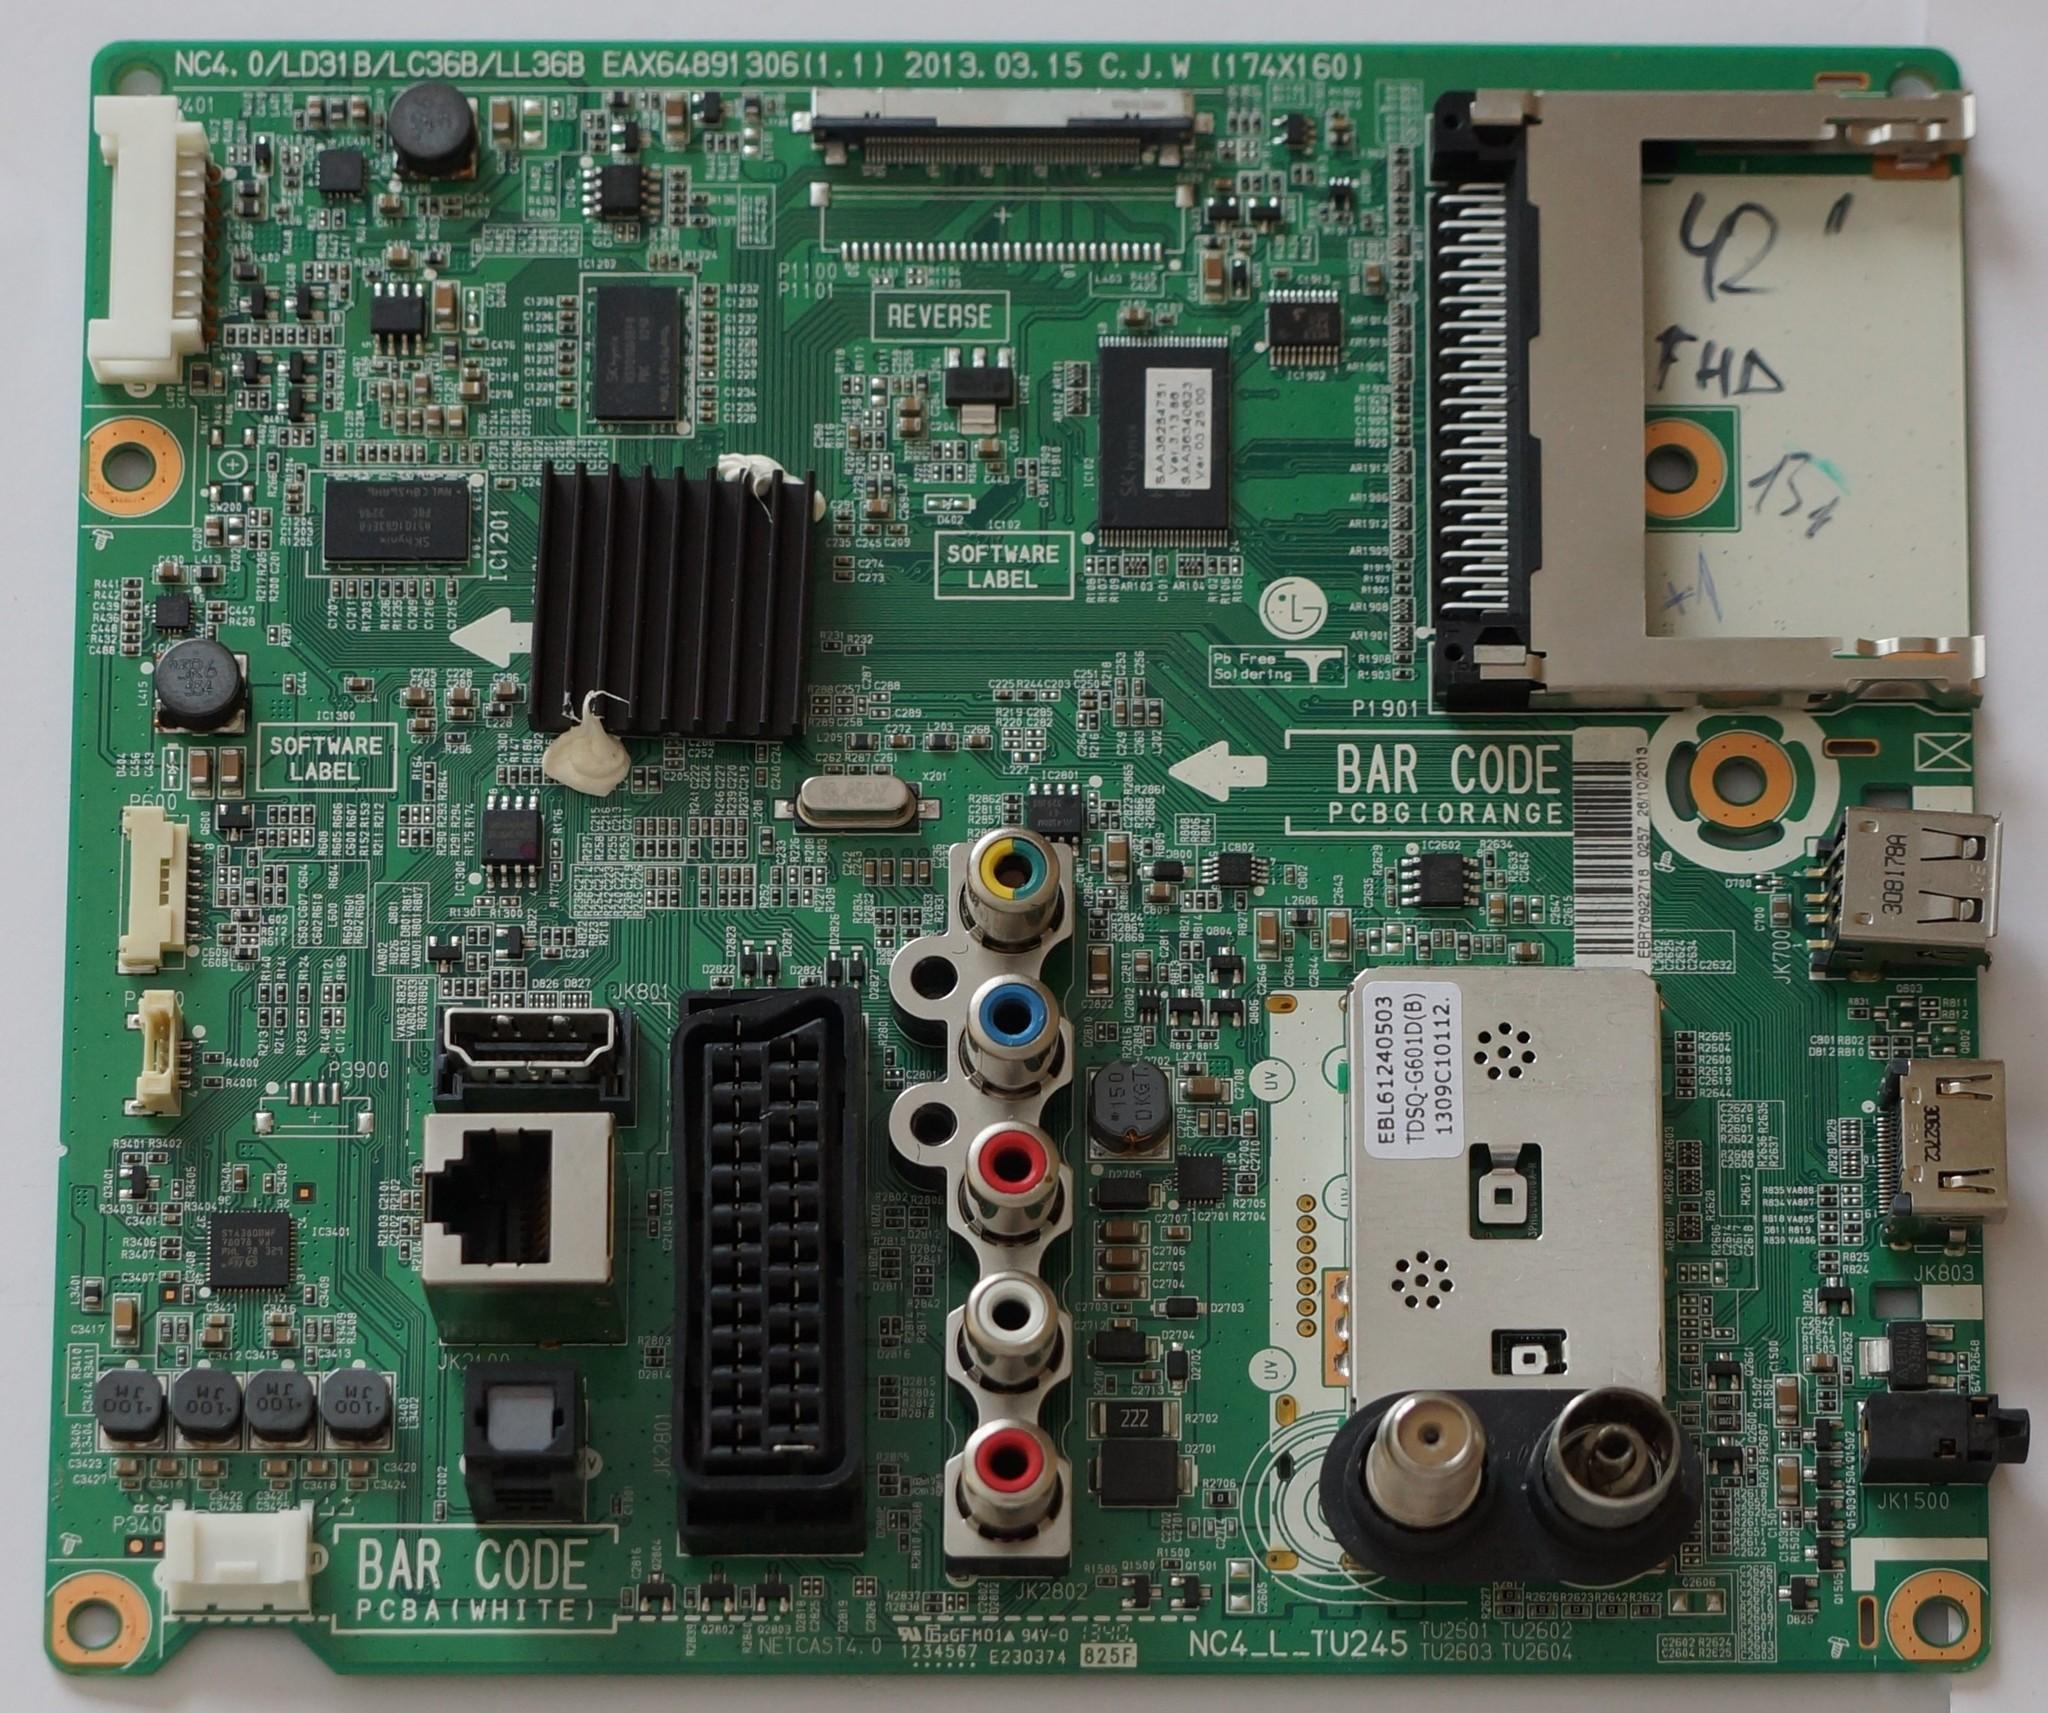 EAX64891306(1.1) EBR76922718 купить